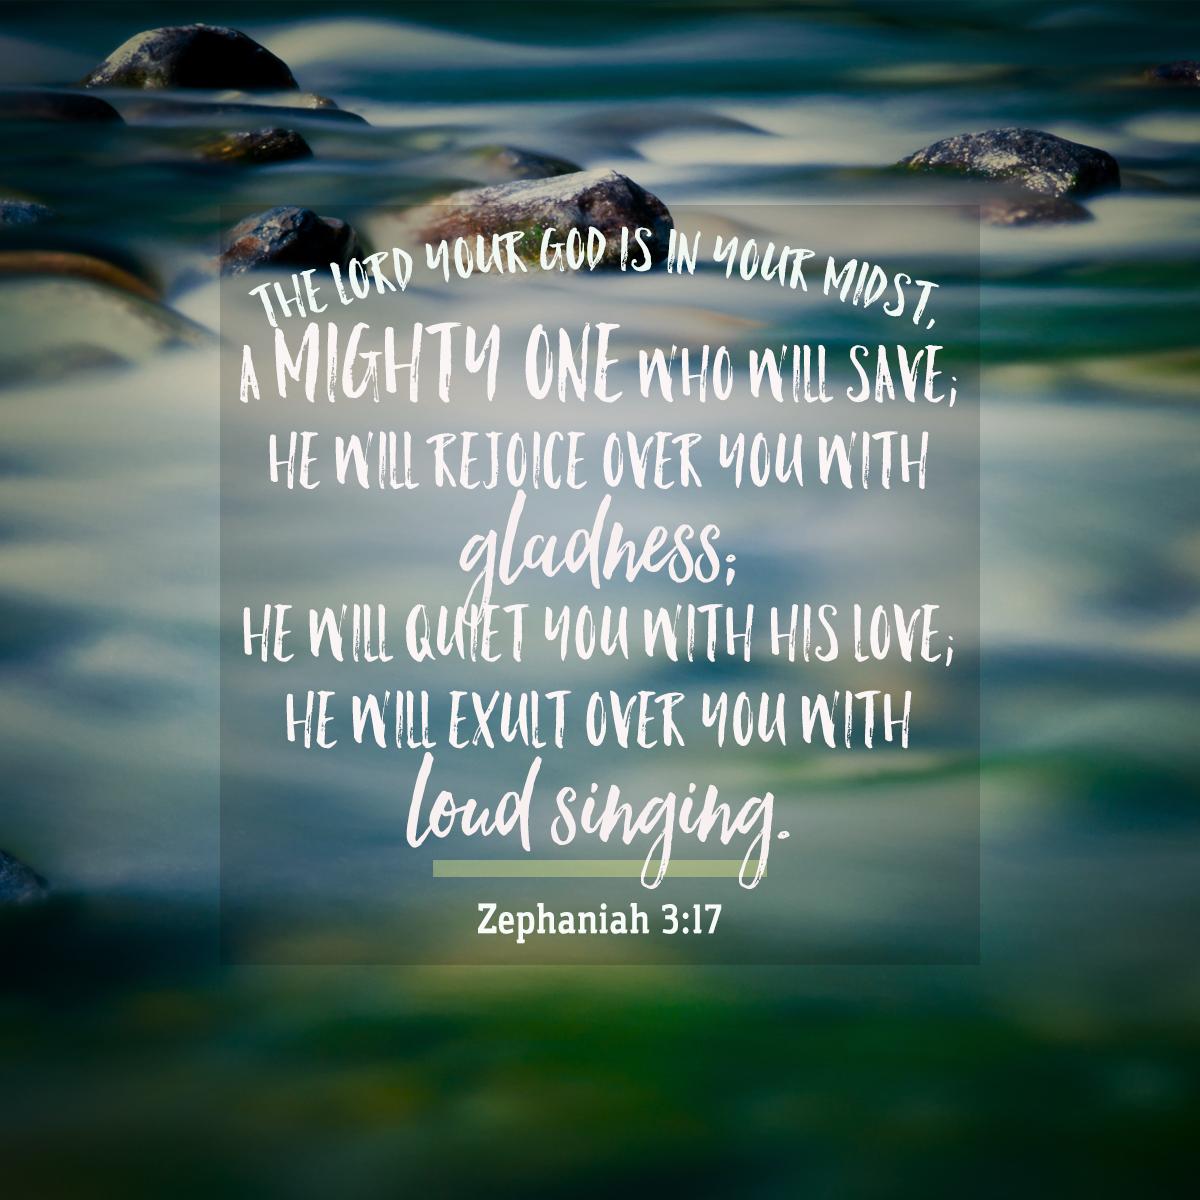 Zephaniah 3:17-